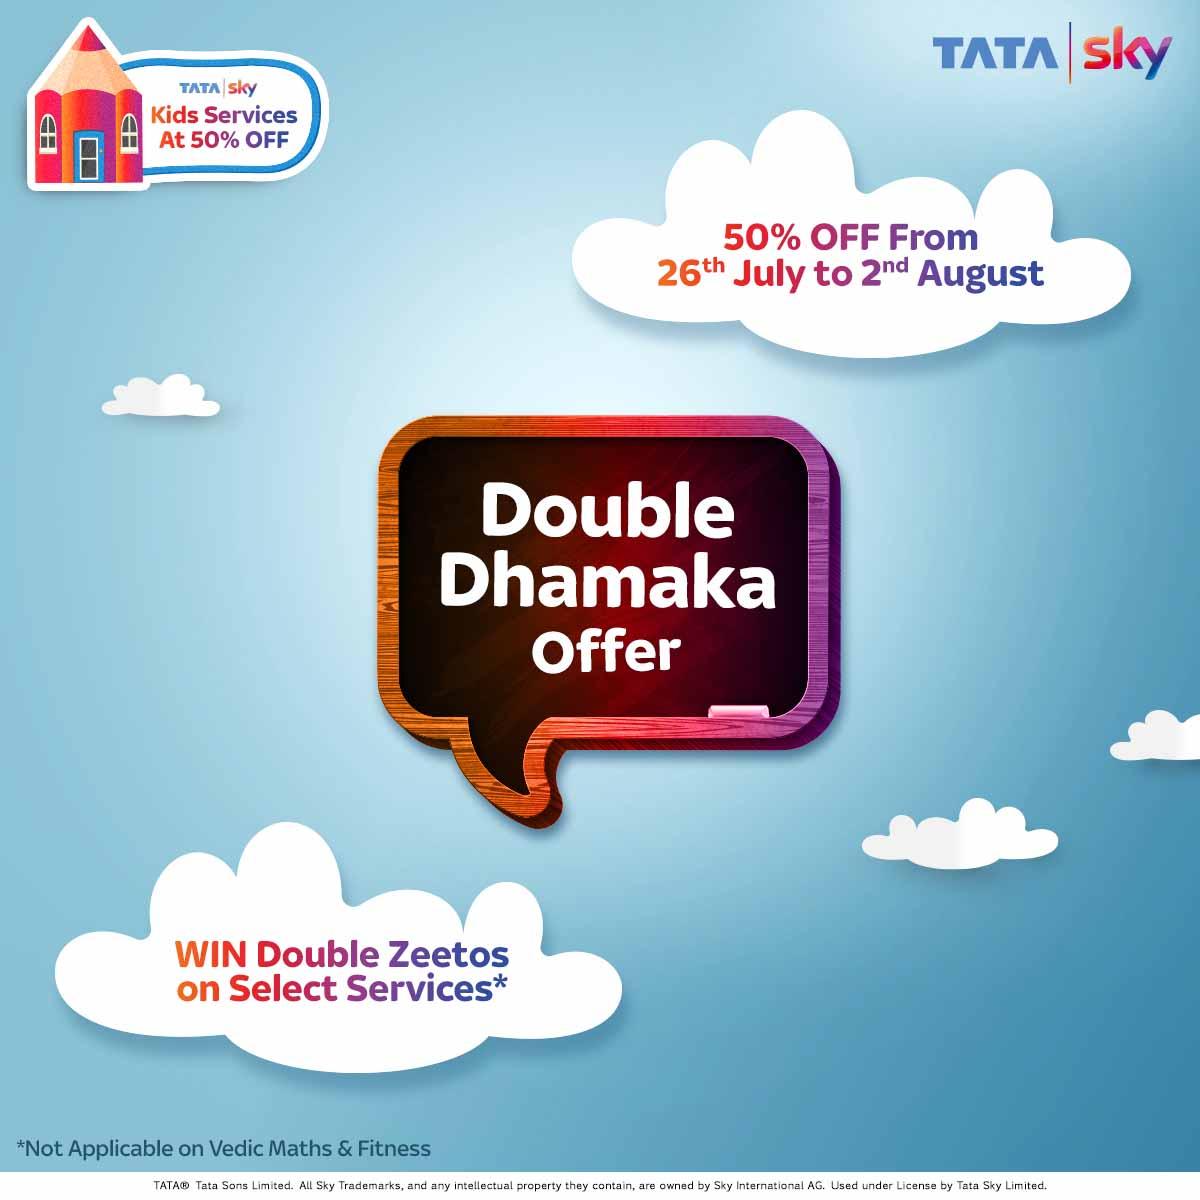 Tata Sky Double Dhamaka Offer